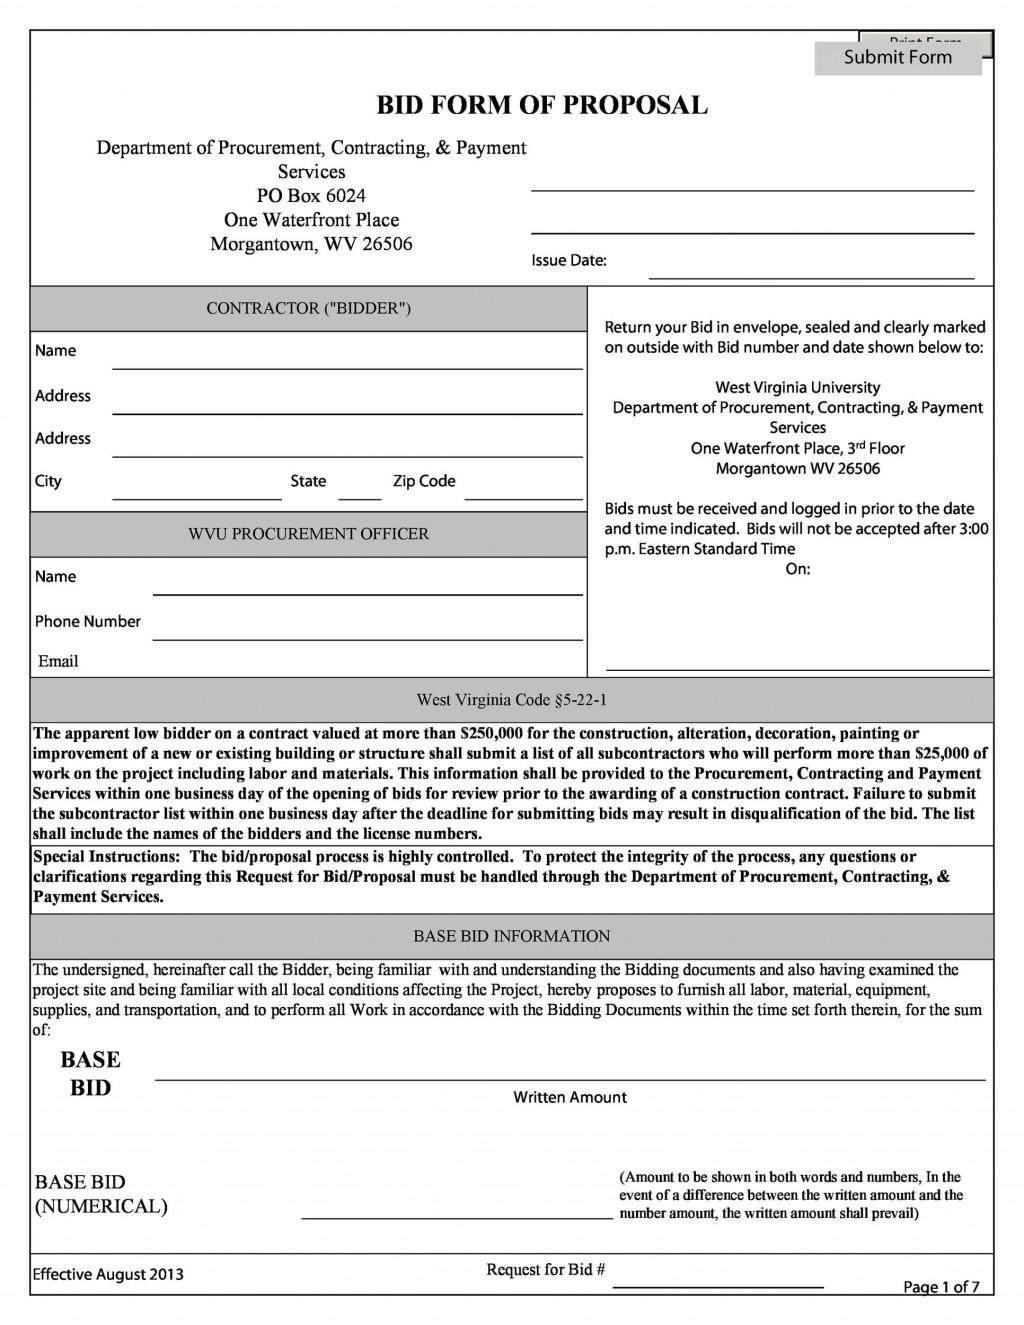 004 Shocking Free Construction Proposal Template Concept  Bid Contractor WordLarge